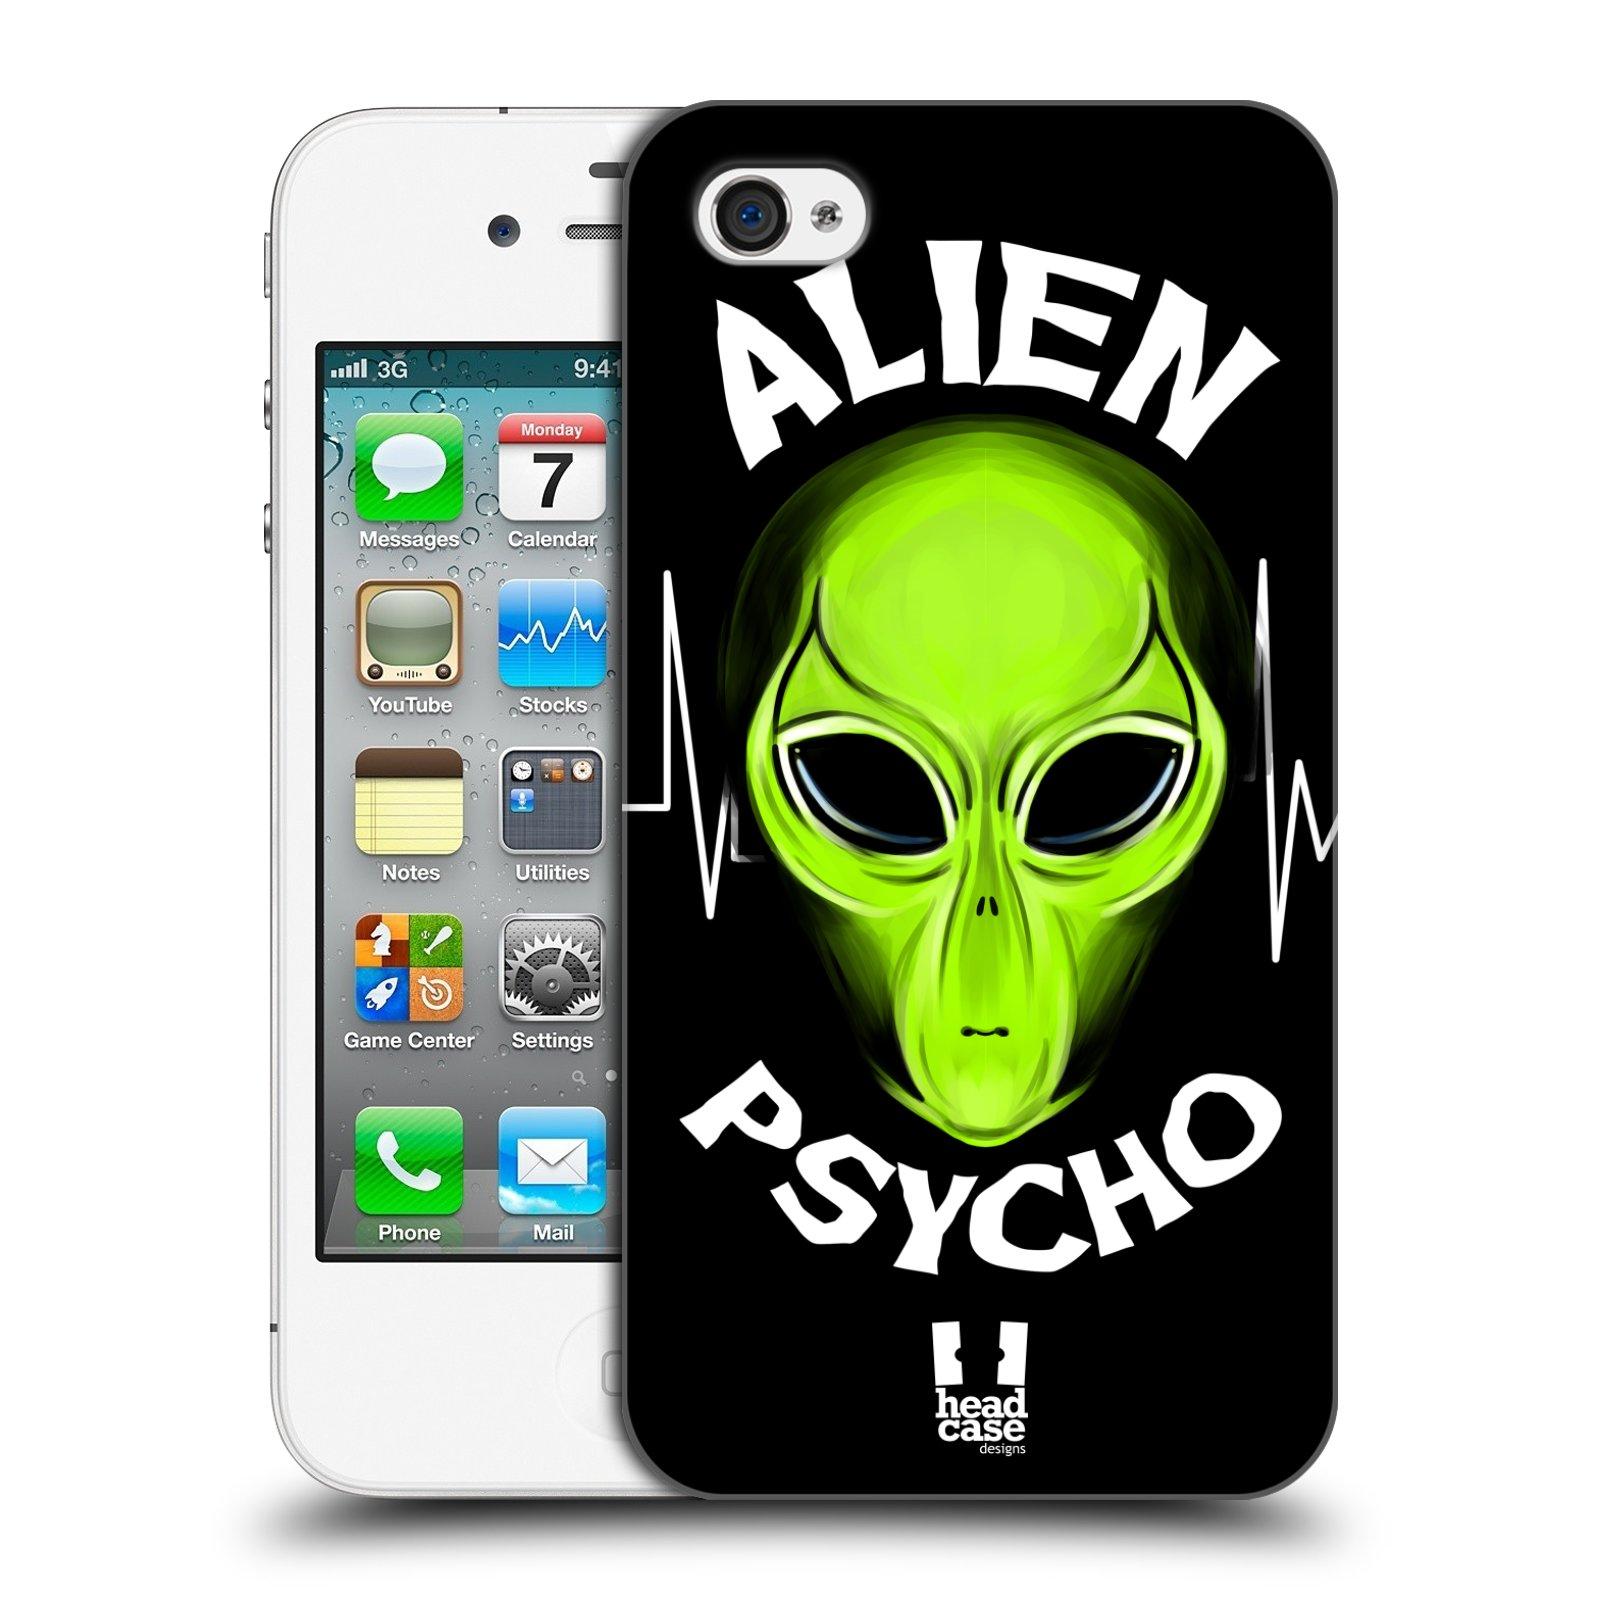 Plastové pouzdro na mobil Apple iPhone 4 a 4S HEAD CASE ALIENS PSYCHO